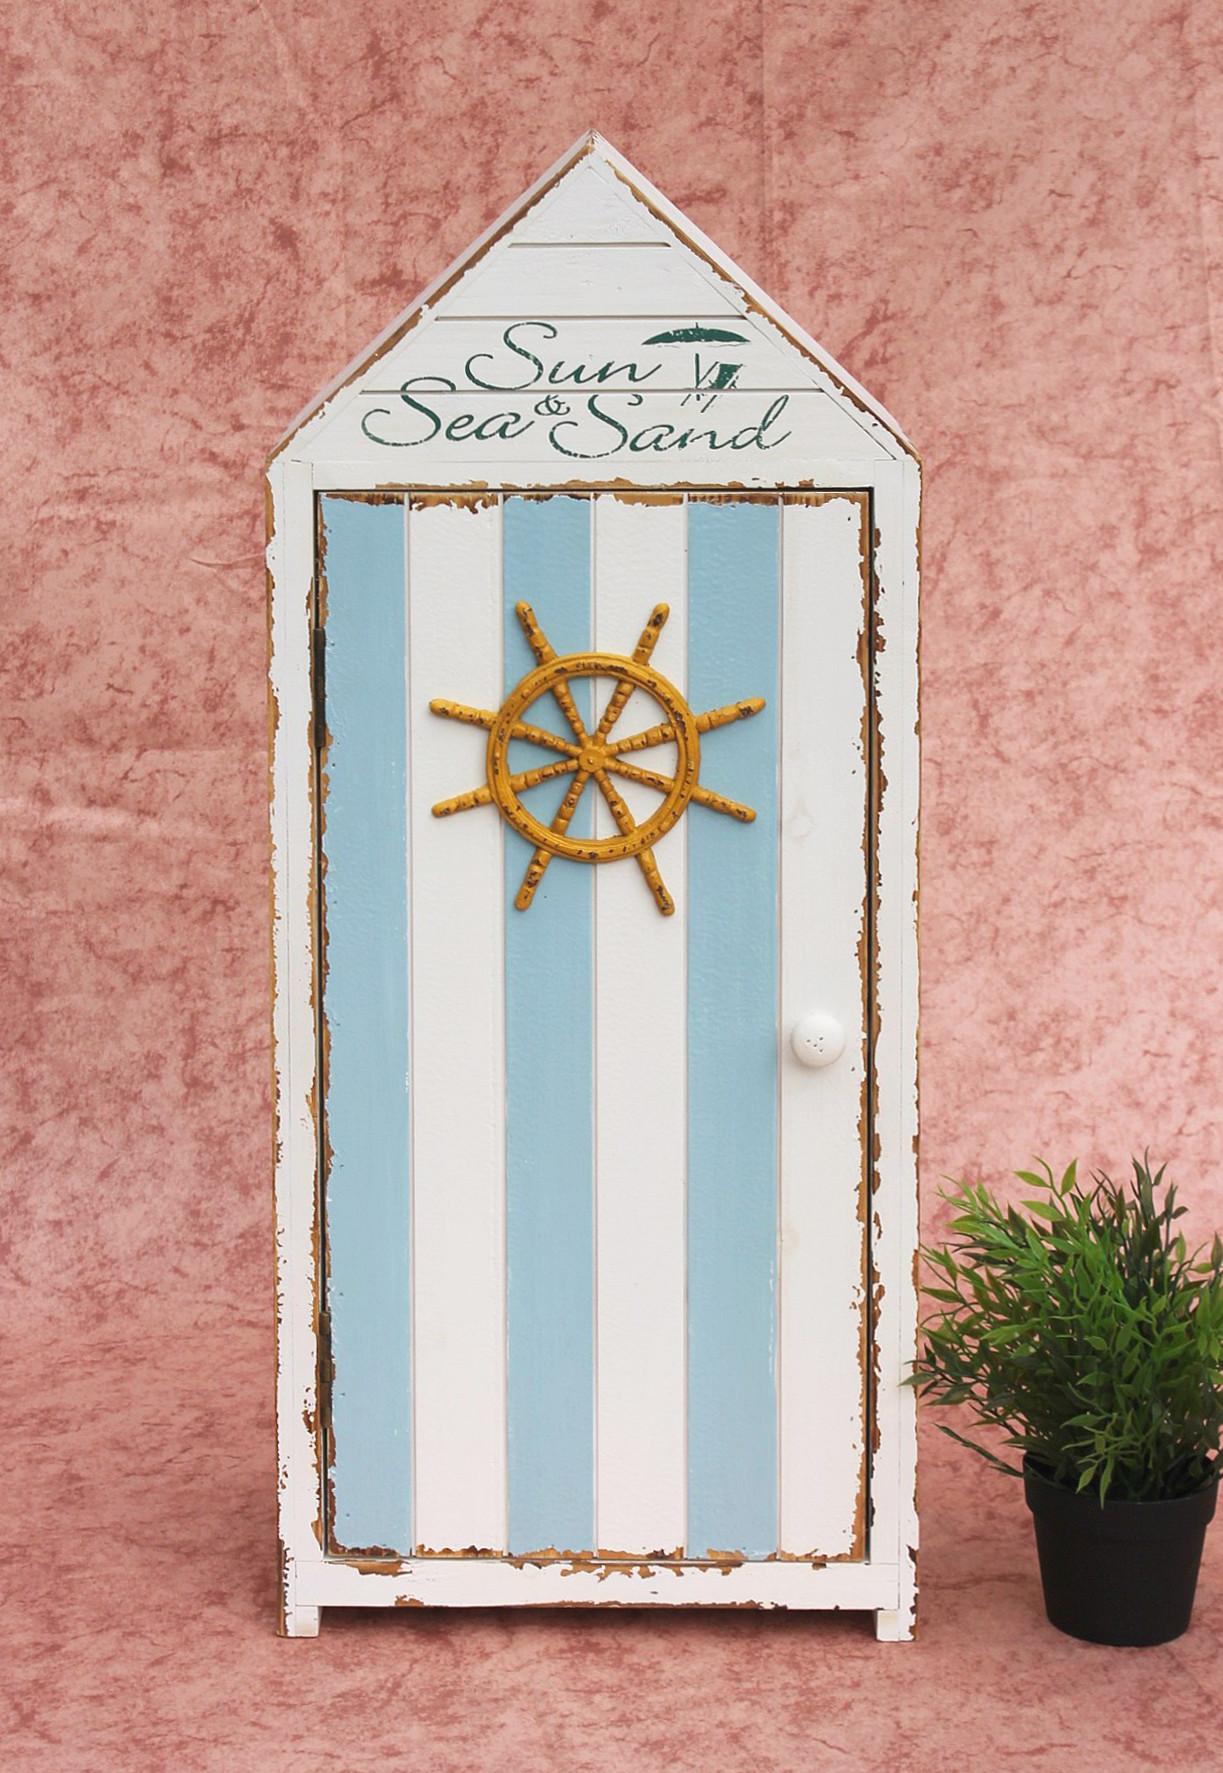 badschrank 16a055 s maritim regal 77cm badregal shabby. Black Bedroom Furniture Sets. Home Design Ideas